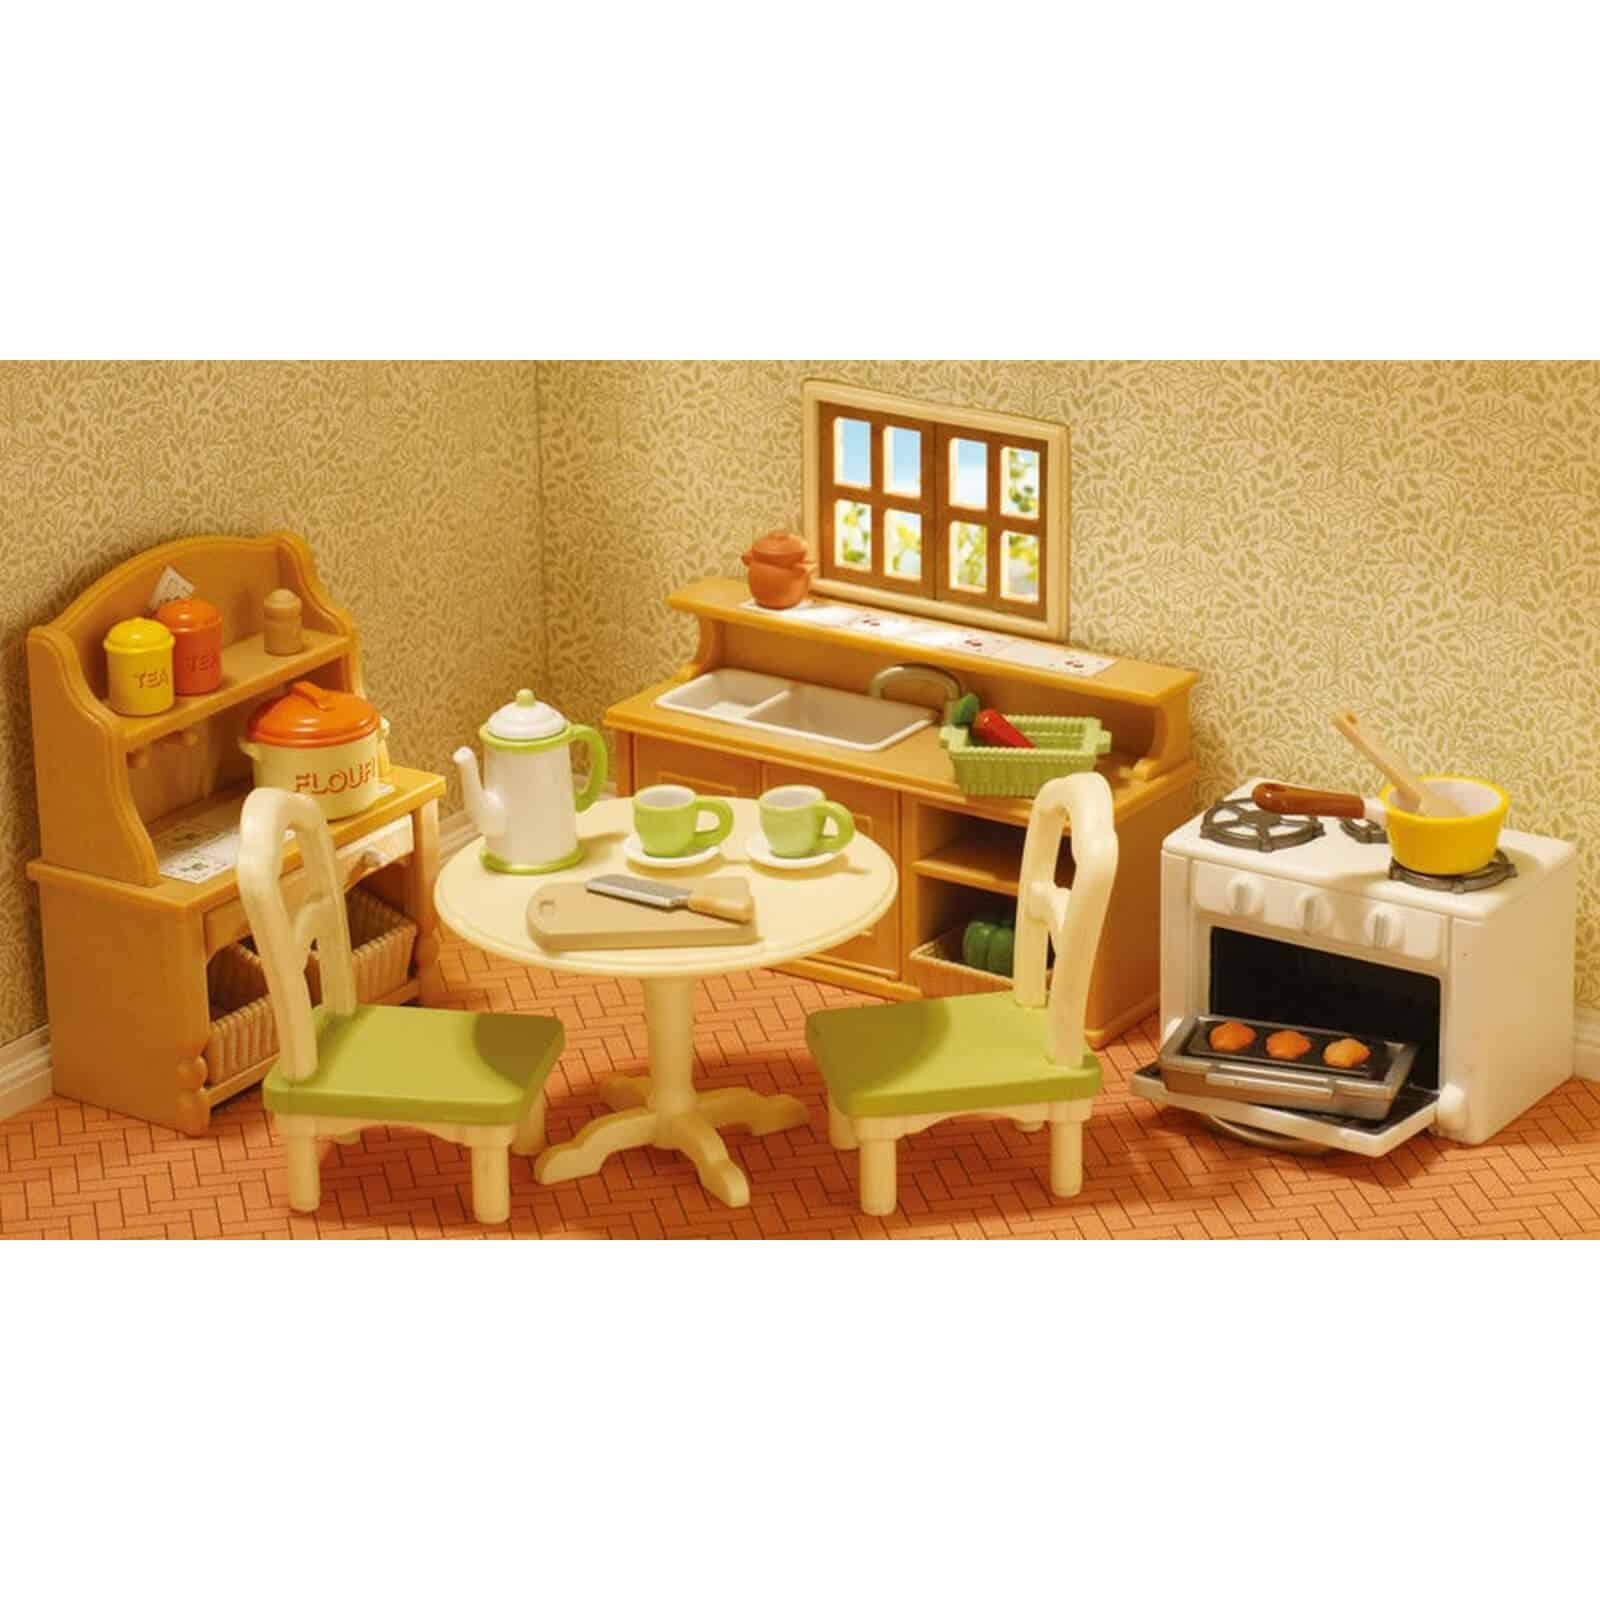 Sylvanian Families Living Room Set Picture Bedroom Design